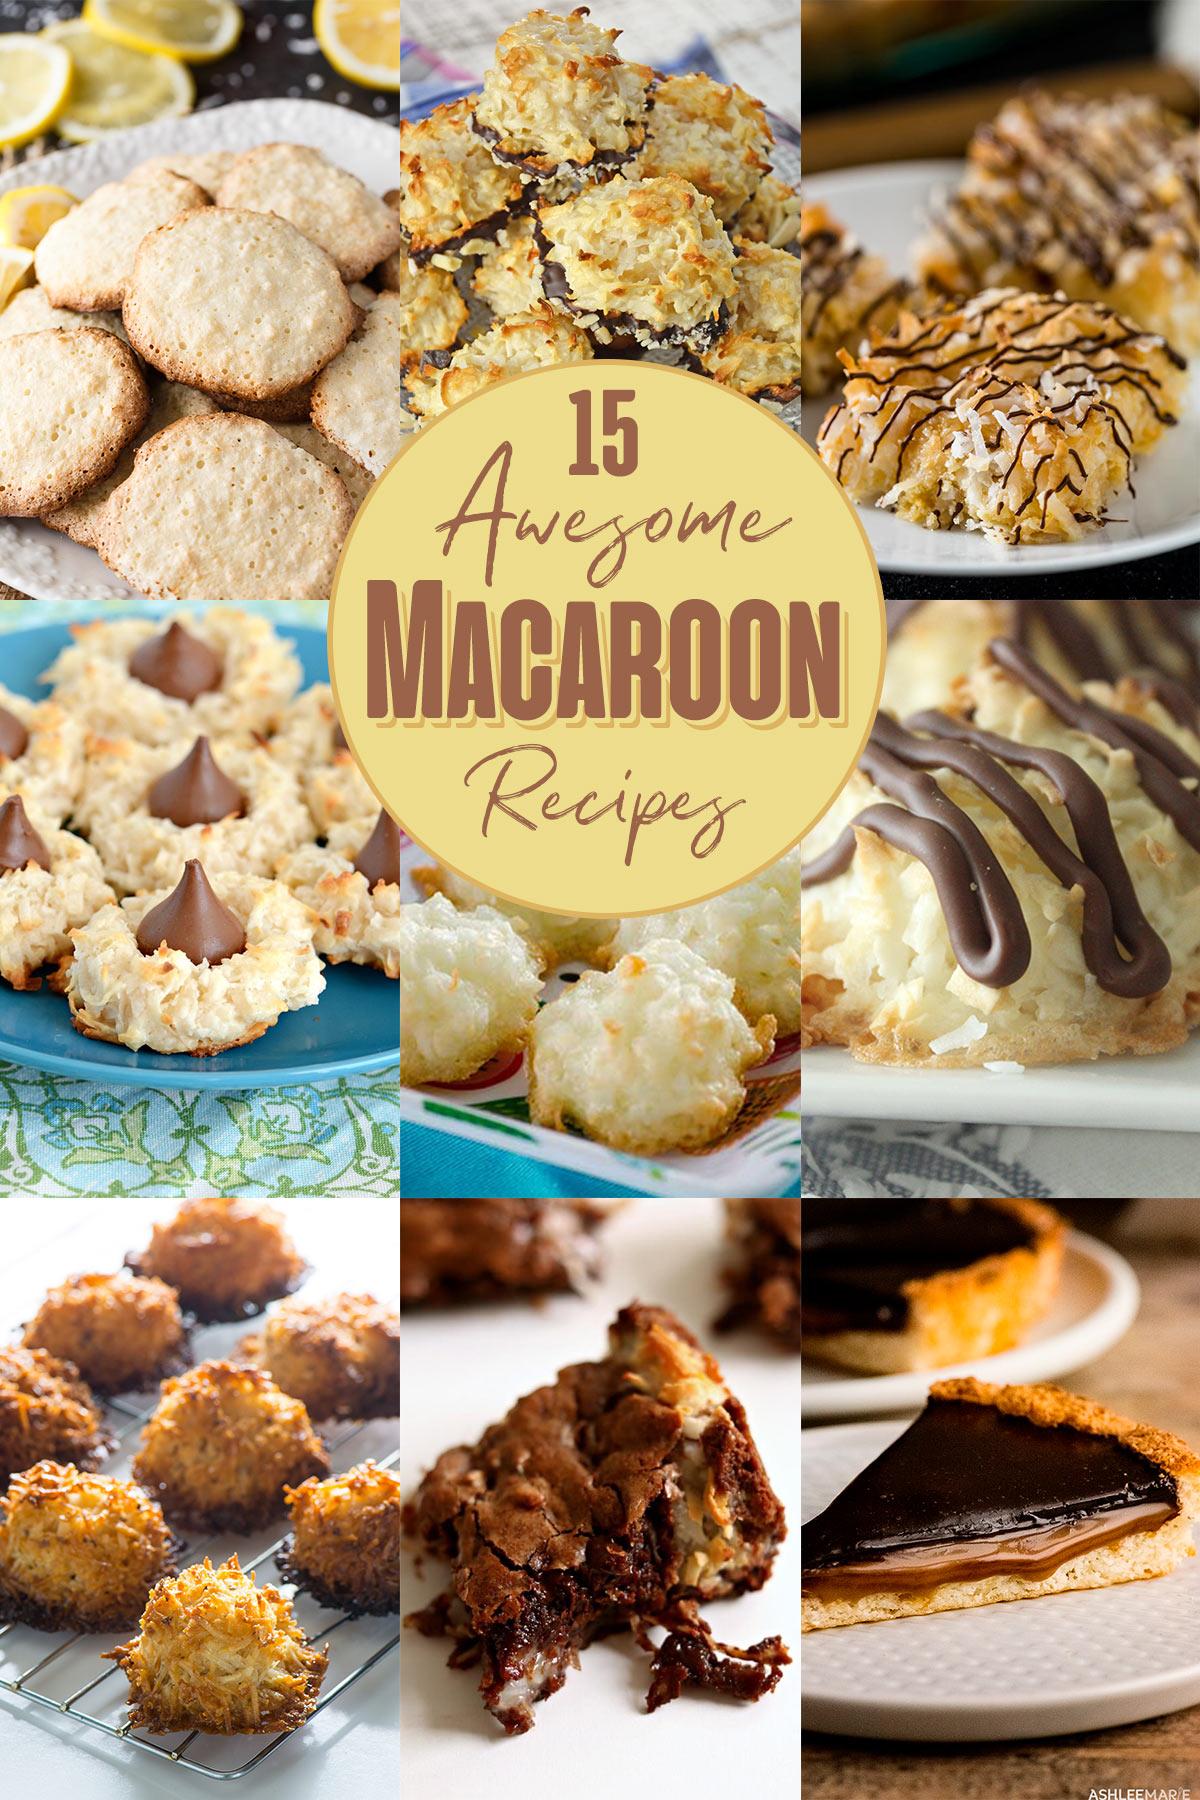 15 Awesome Macaroon Recipes   realmomkitchen.com #nationalmacaroonday